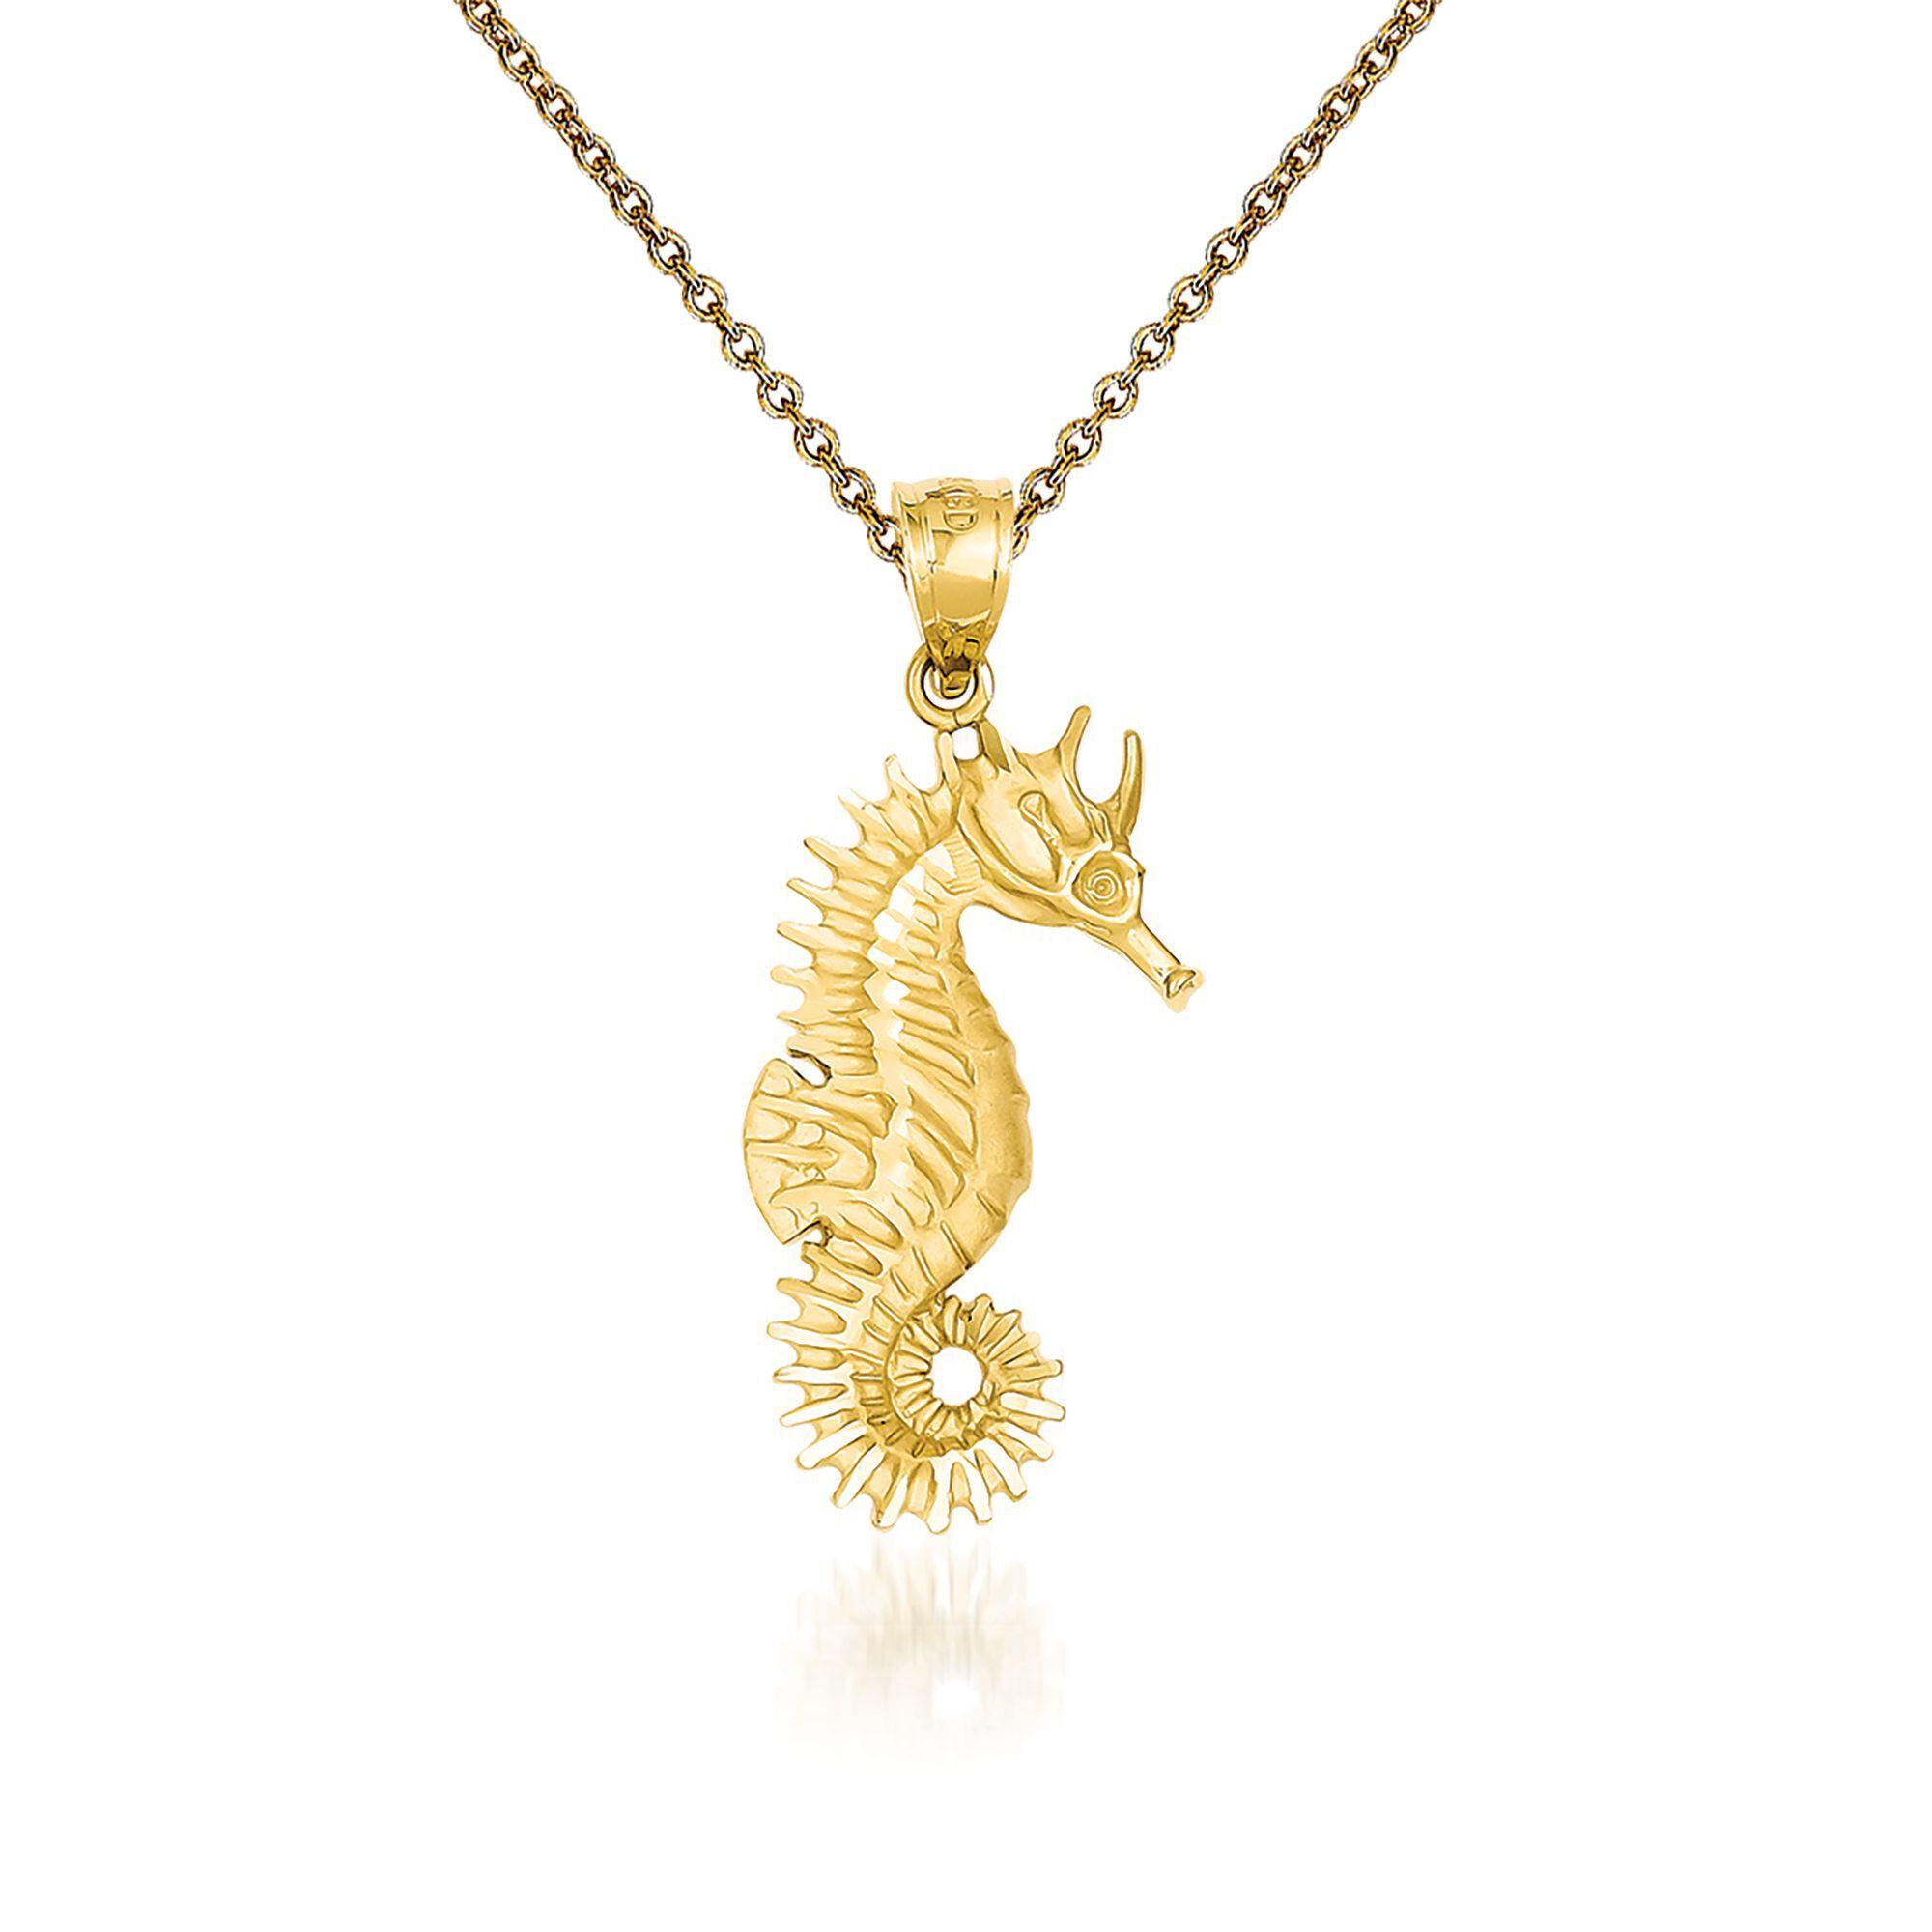 14k Yellow Gold Open Seahorse Pendant Necklace